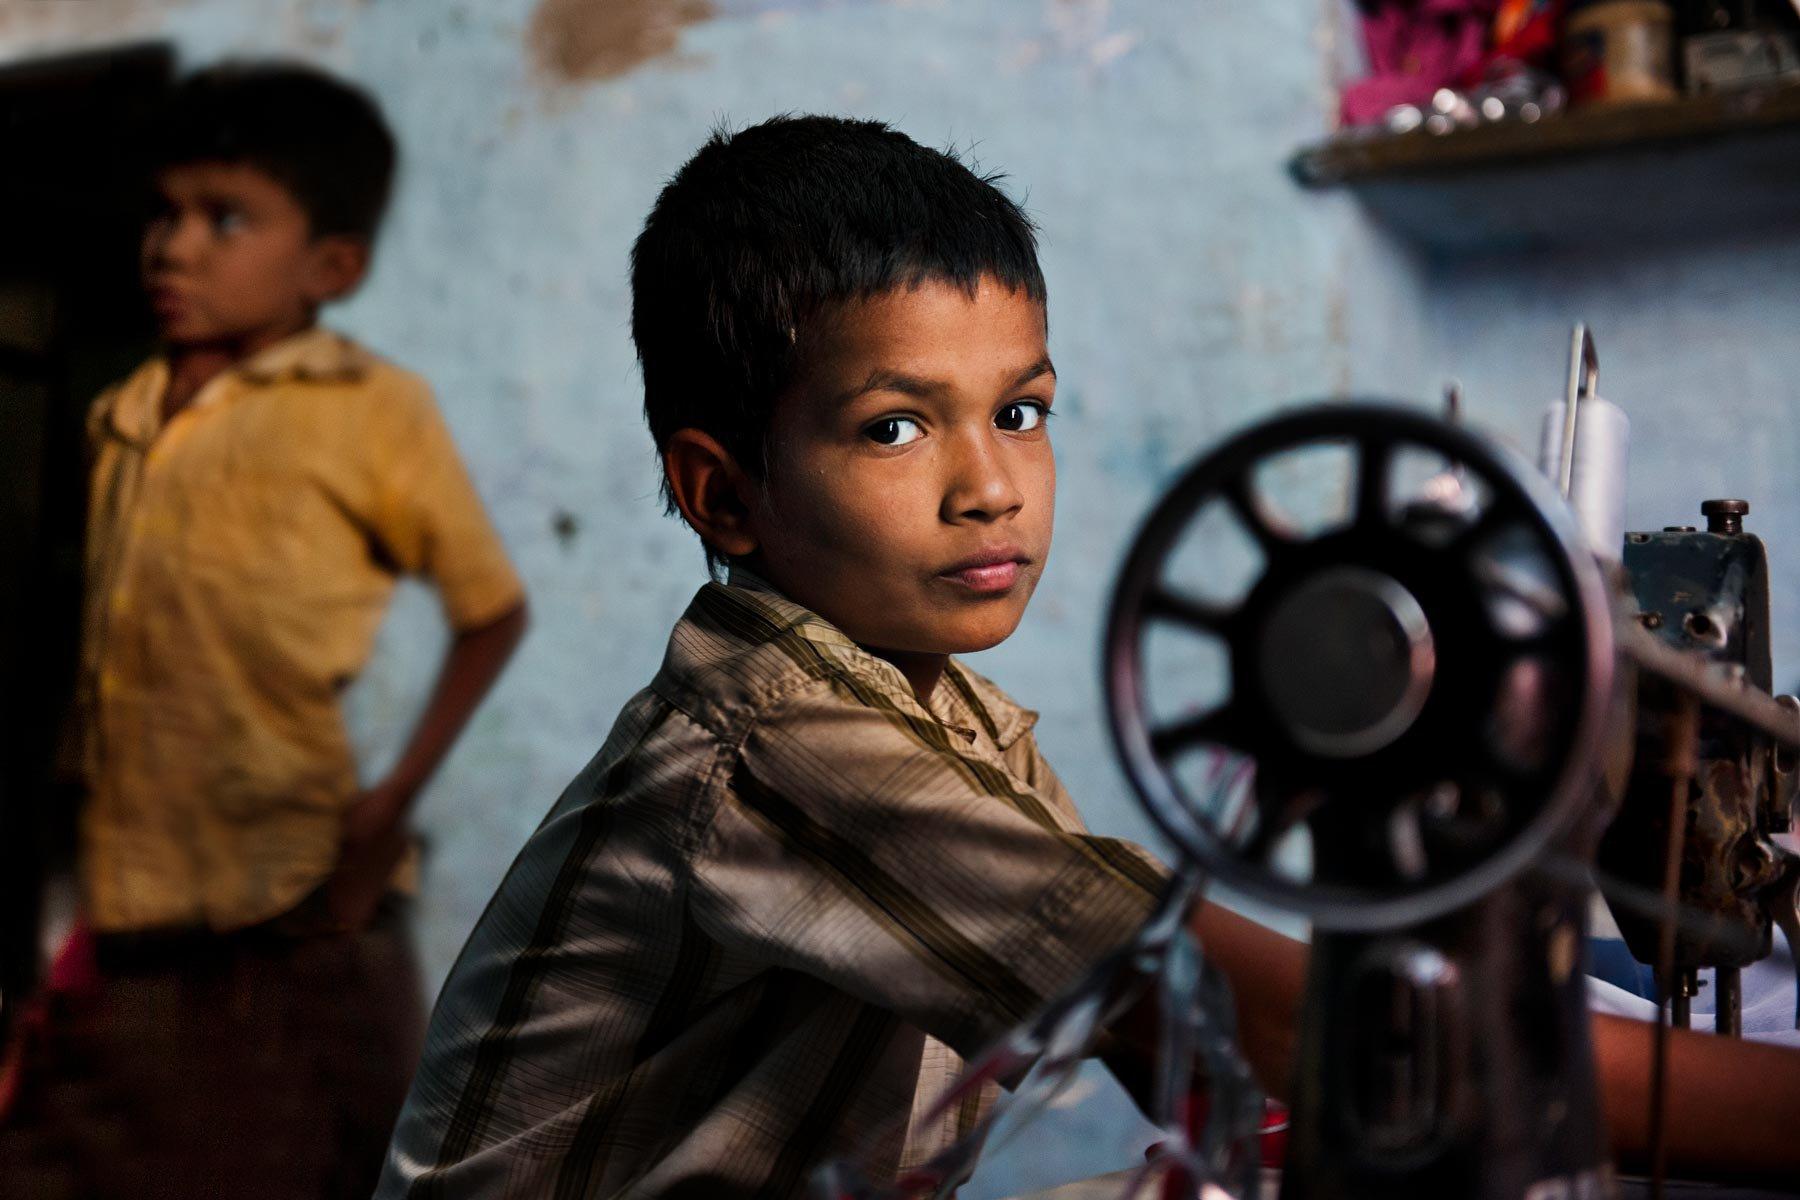 yemen labor law